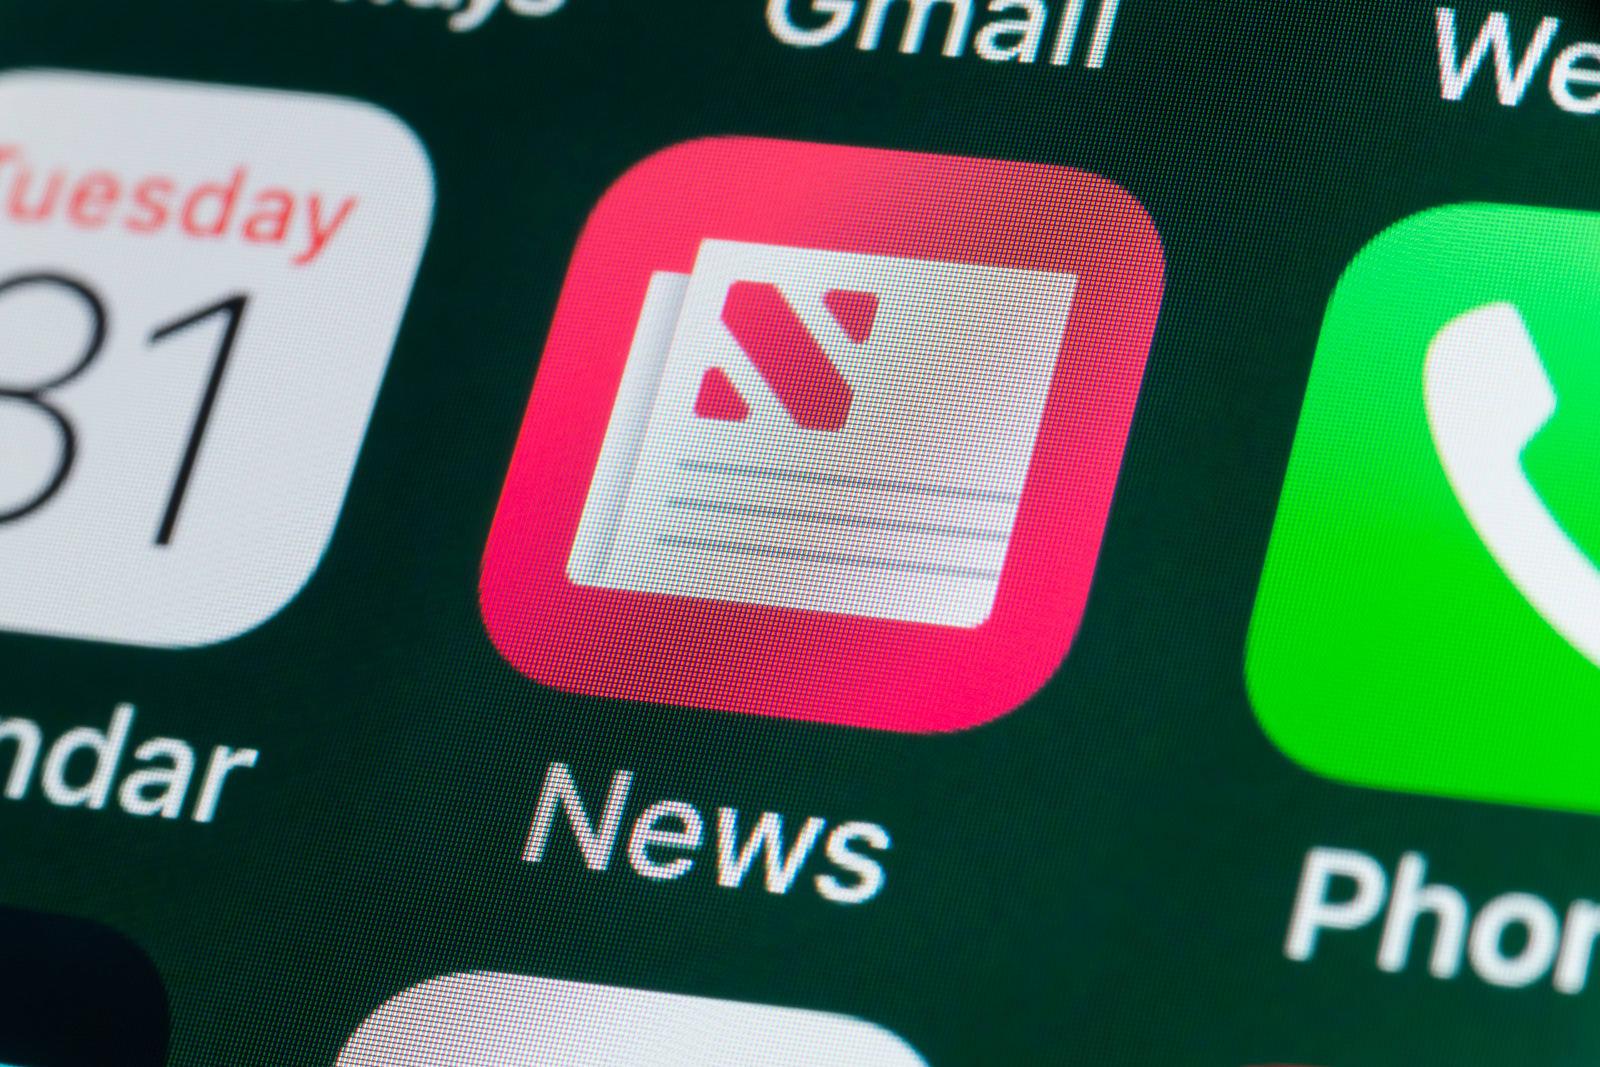 Apple's News app draws 90 million regular readers